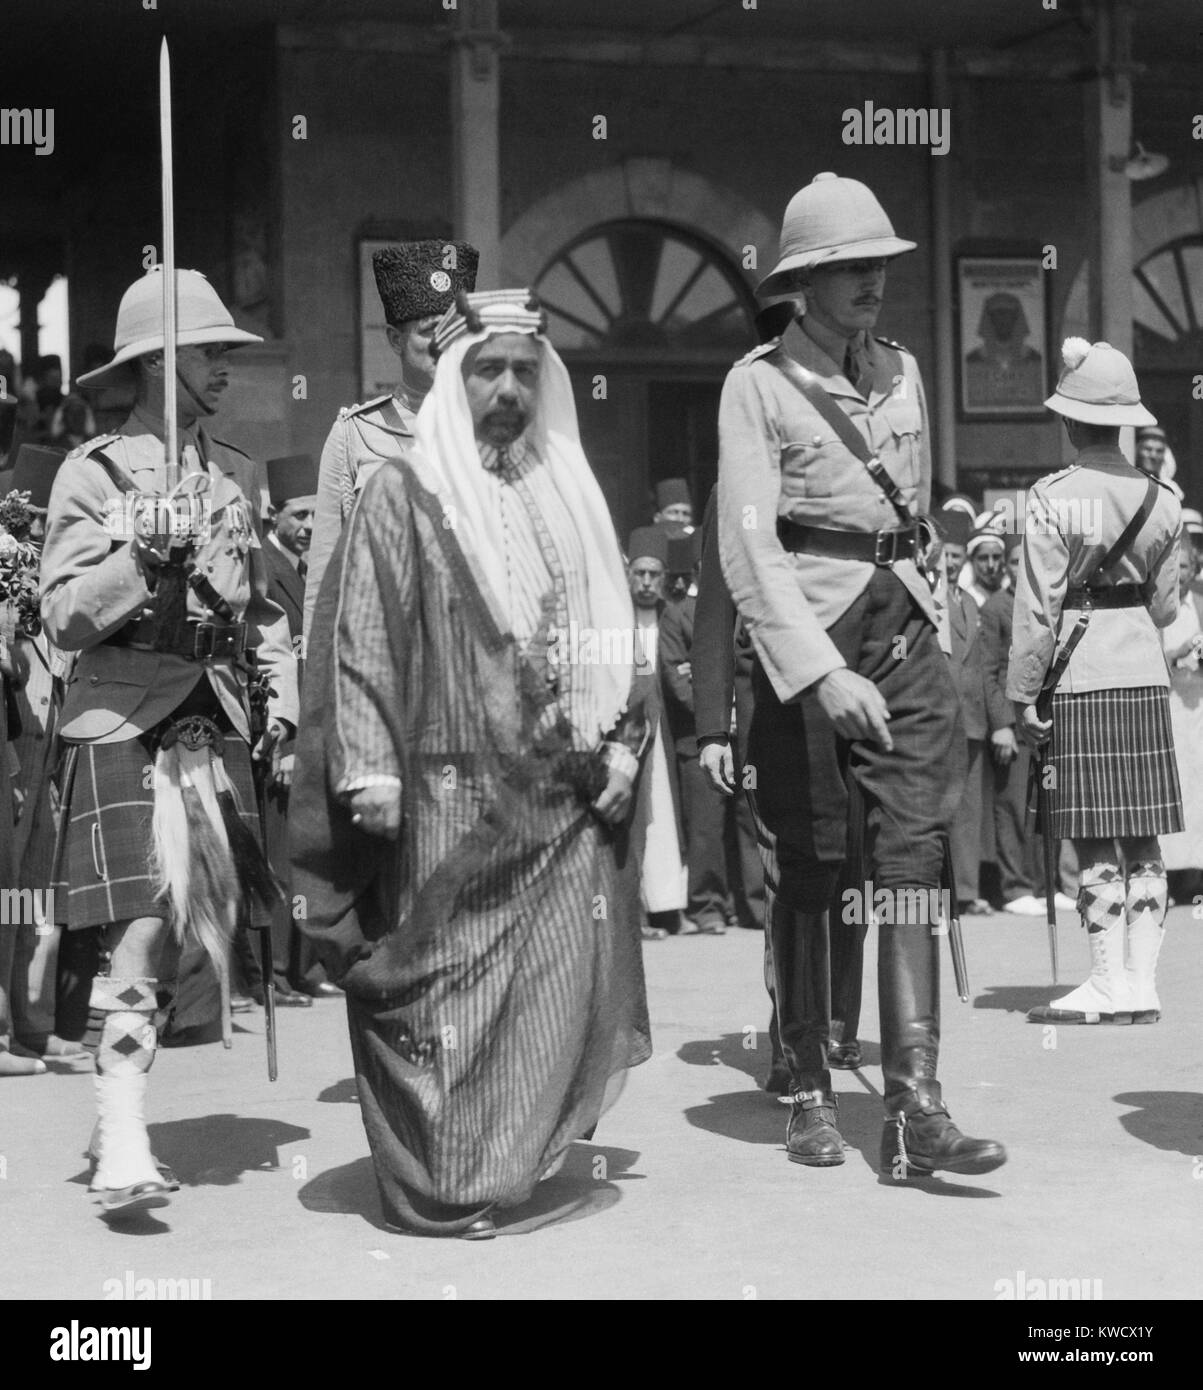 Abdullah I bin al-Hussein, Emir of Transjordan, walking between two British military personel. He was in Jerusalem - Stock Image